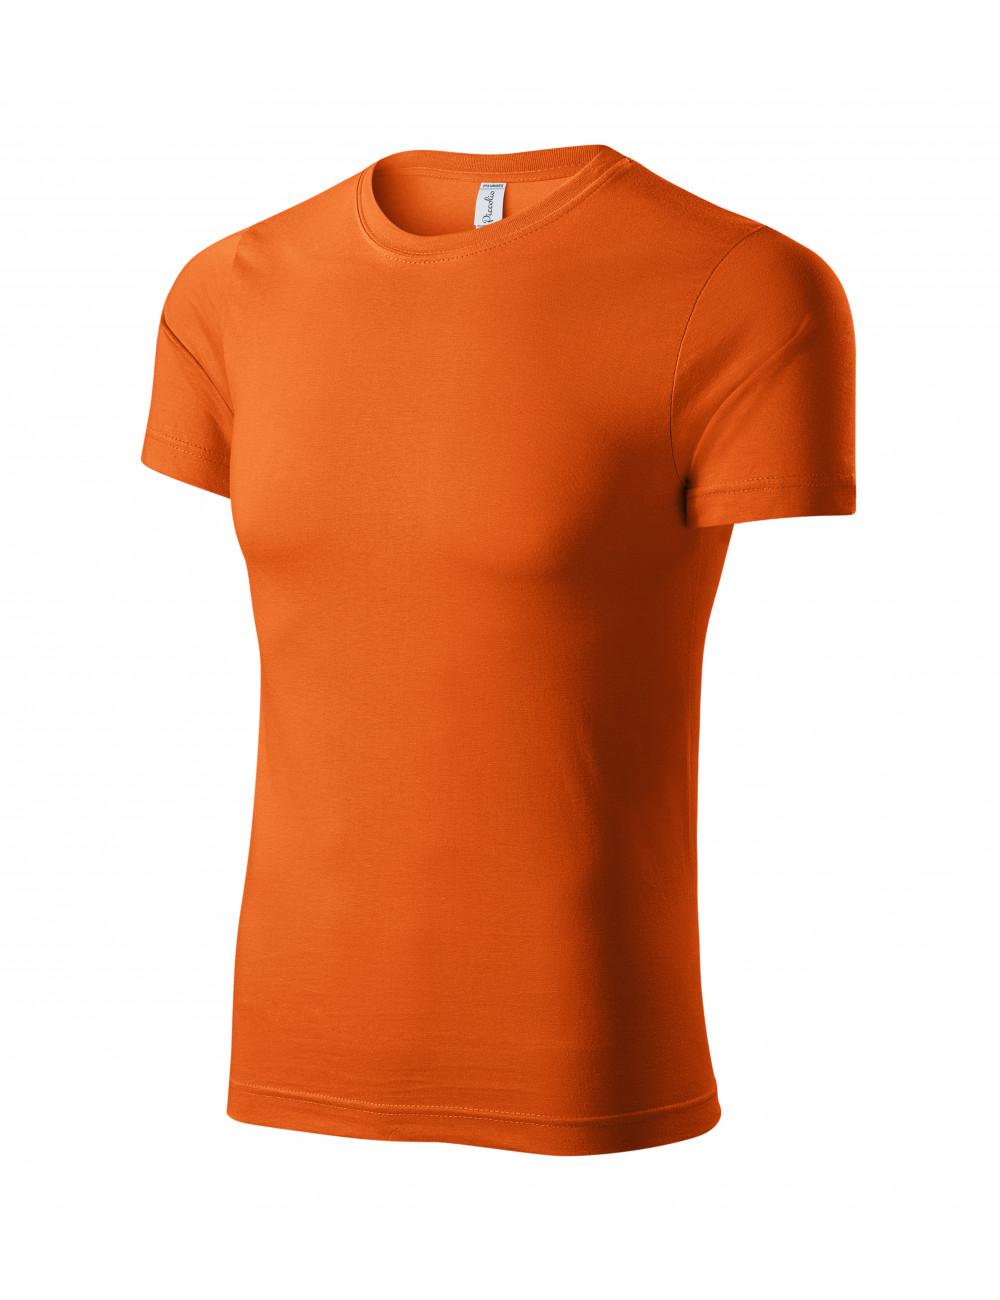 Adler PICCOLIO Koszulka unisex Paint P73 pomarańczowy